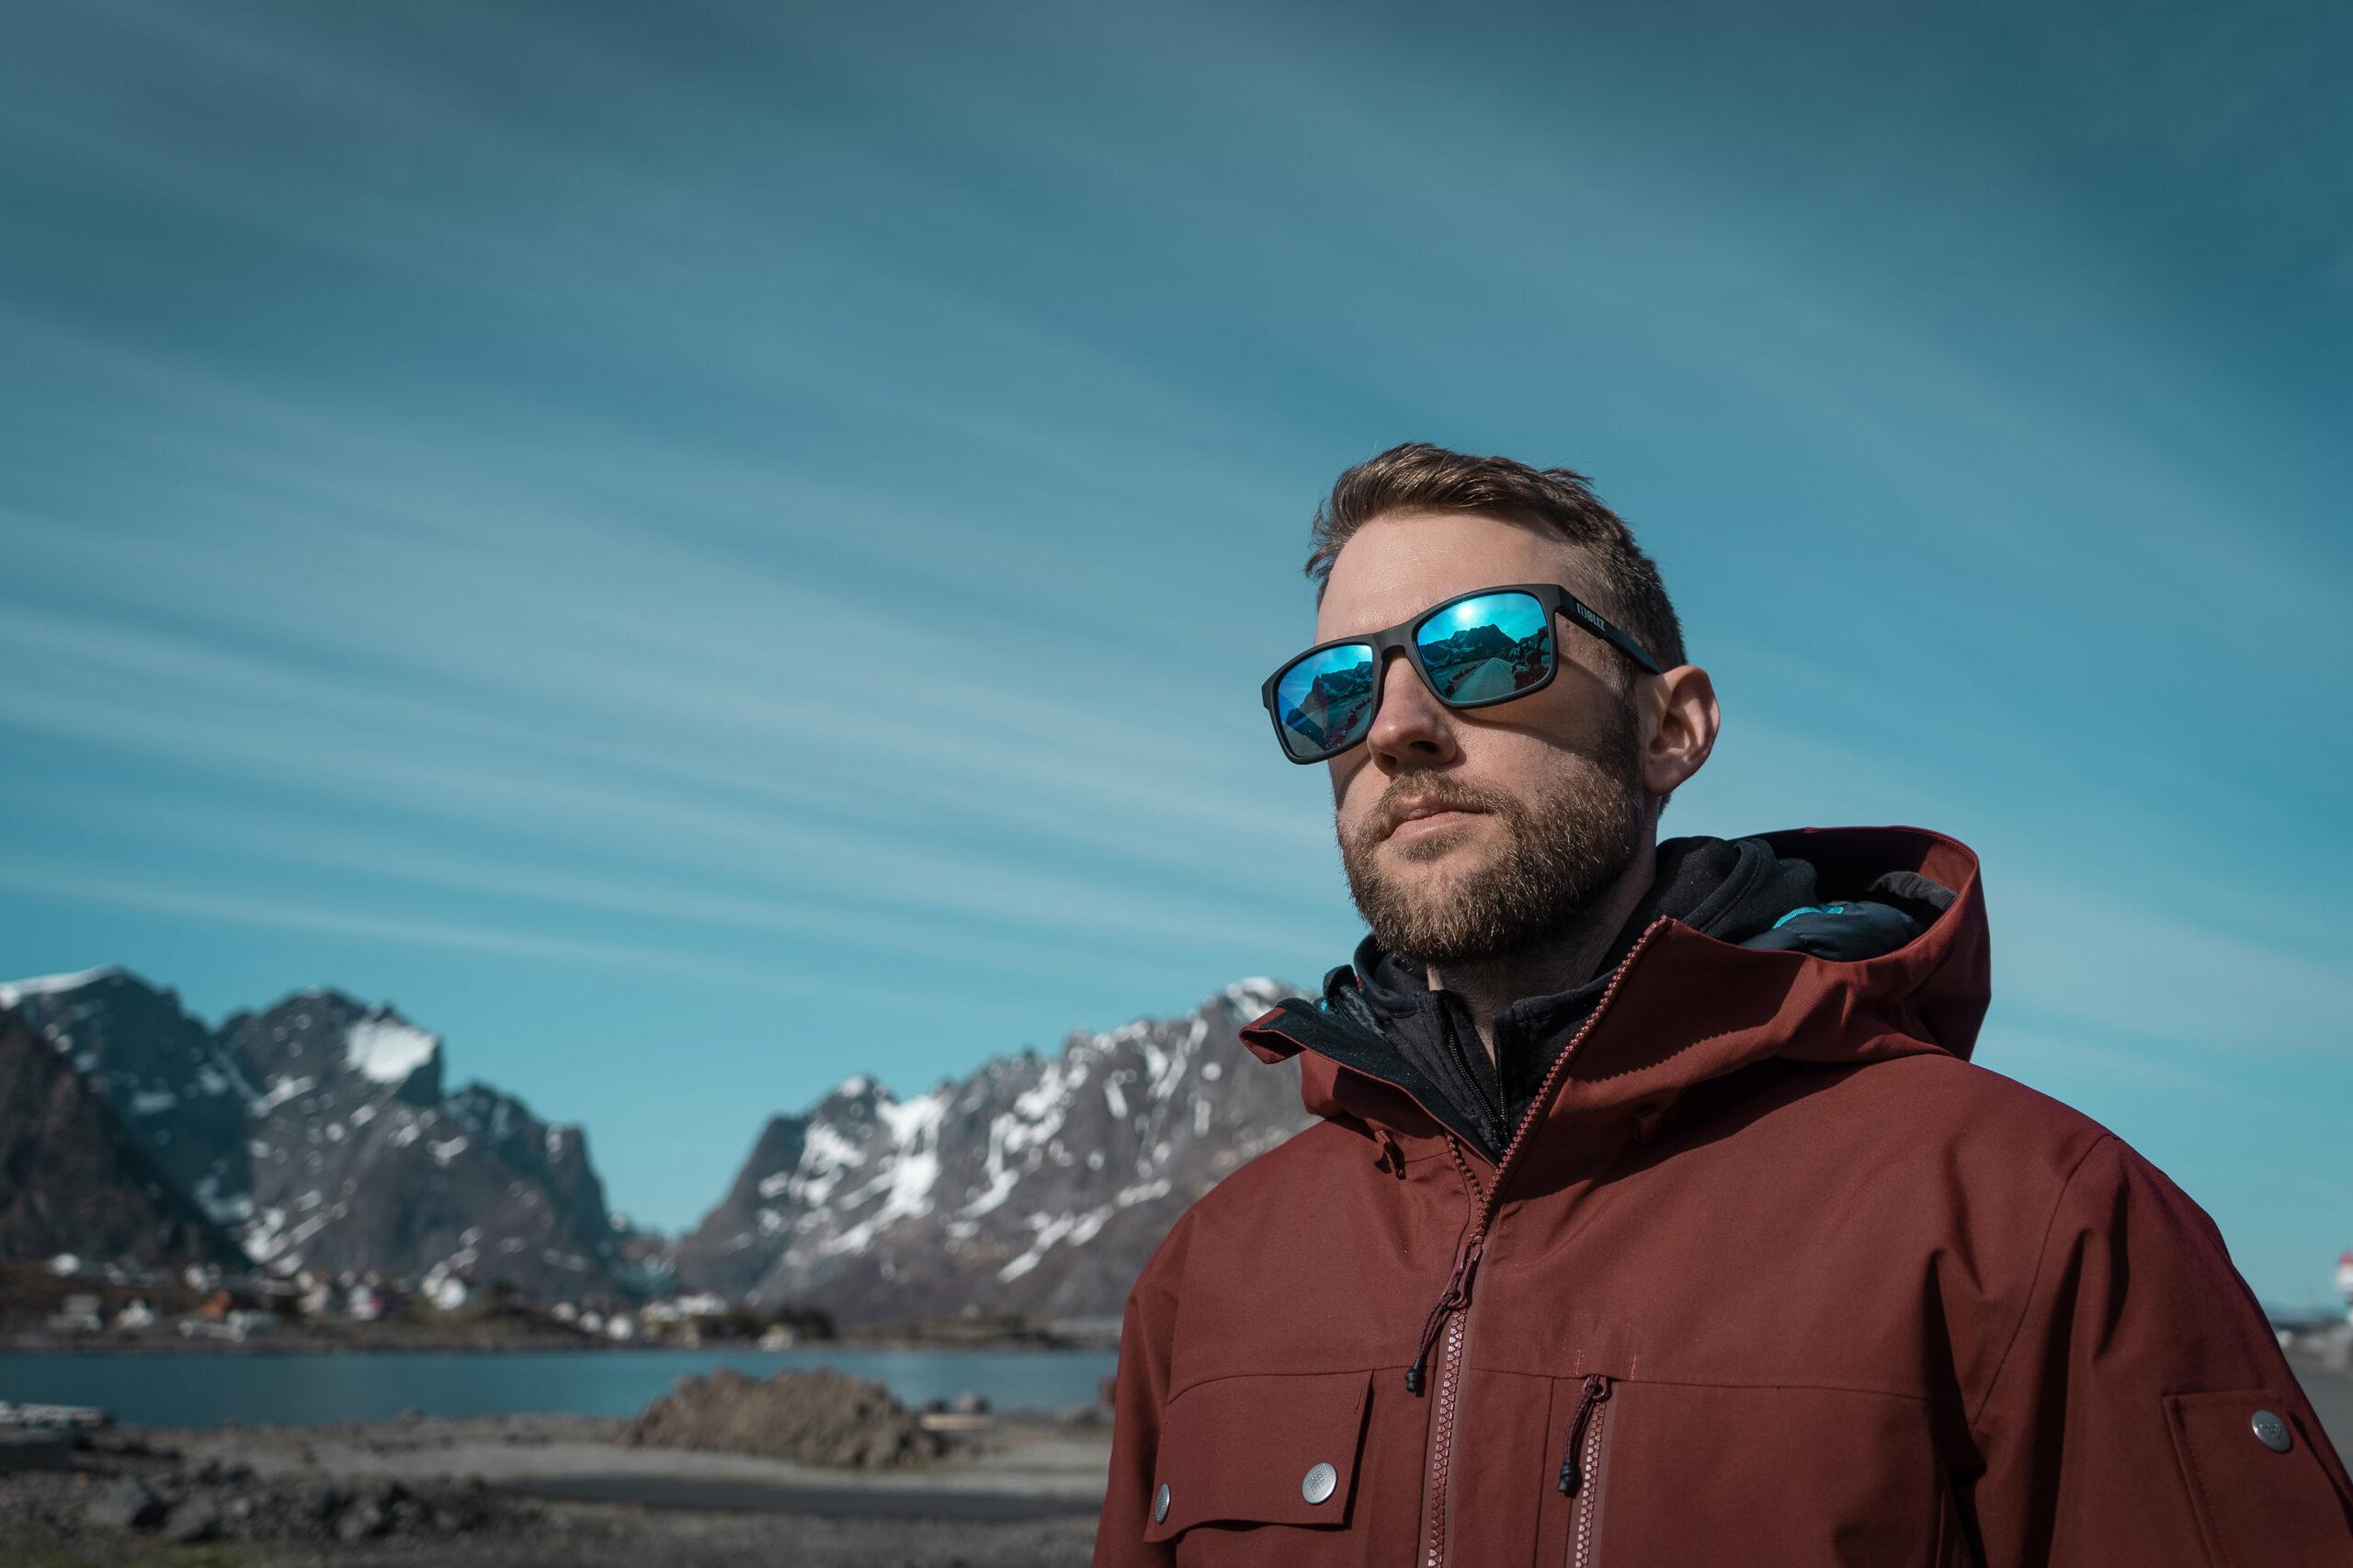 54605-13_luna-bliz sunglasses_adventure_matt black_sportsglasses_lifestyle5